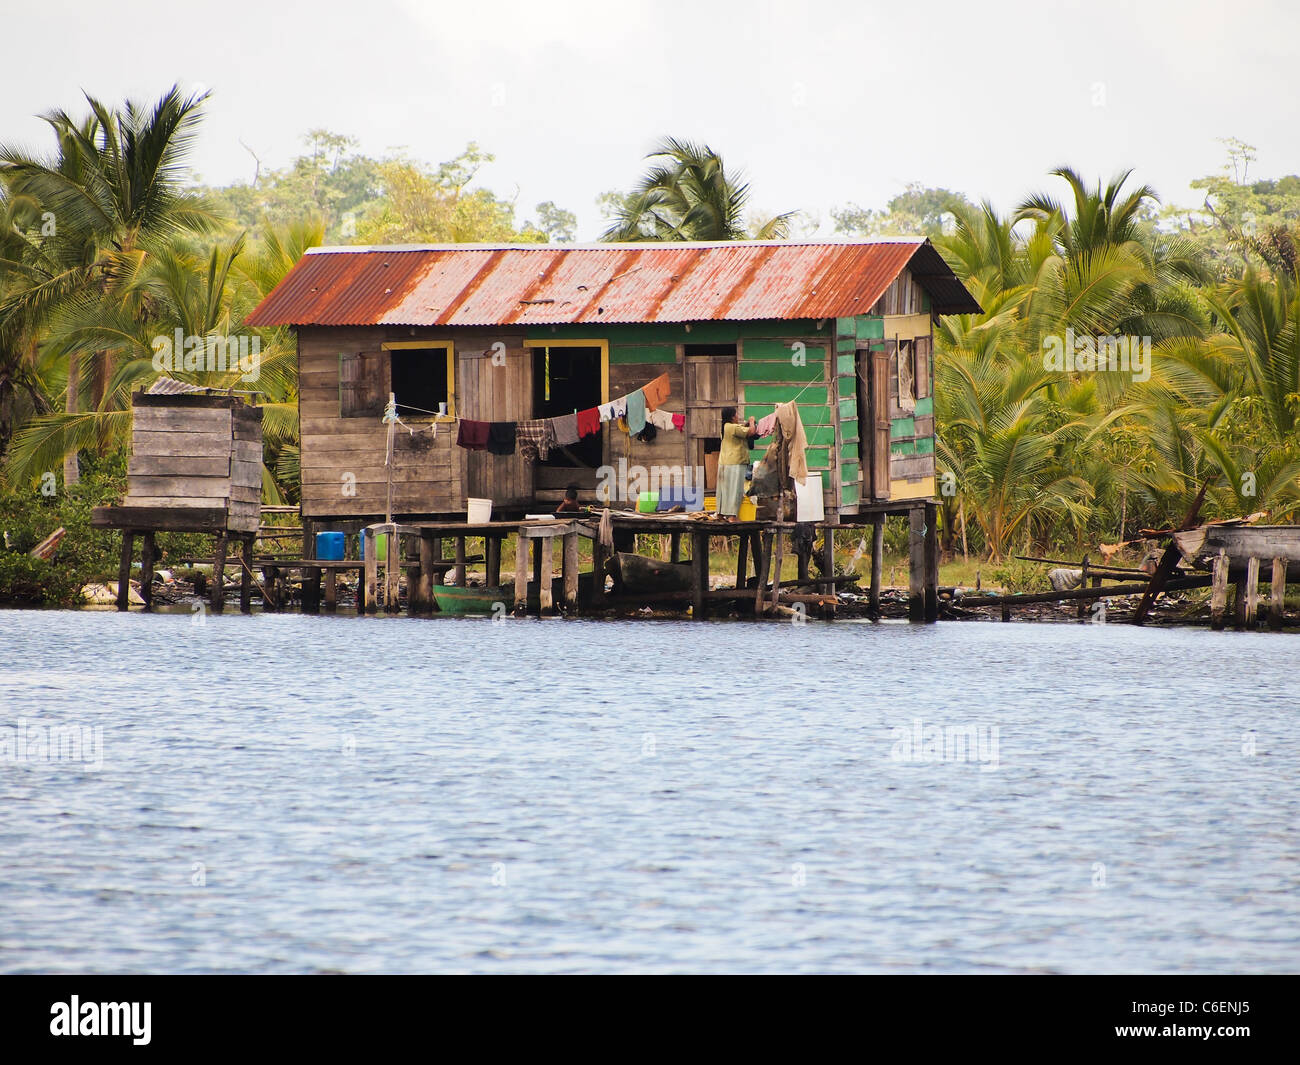 Amerindian native home over the water in Bocas Del Toro - Stock Image